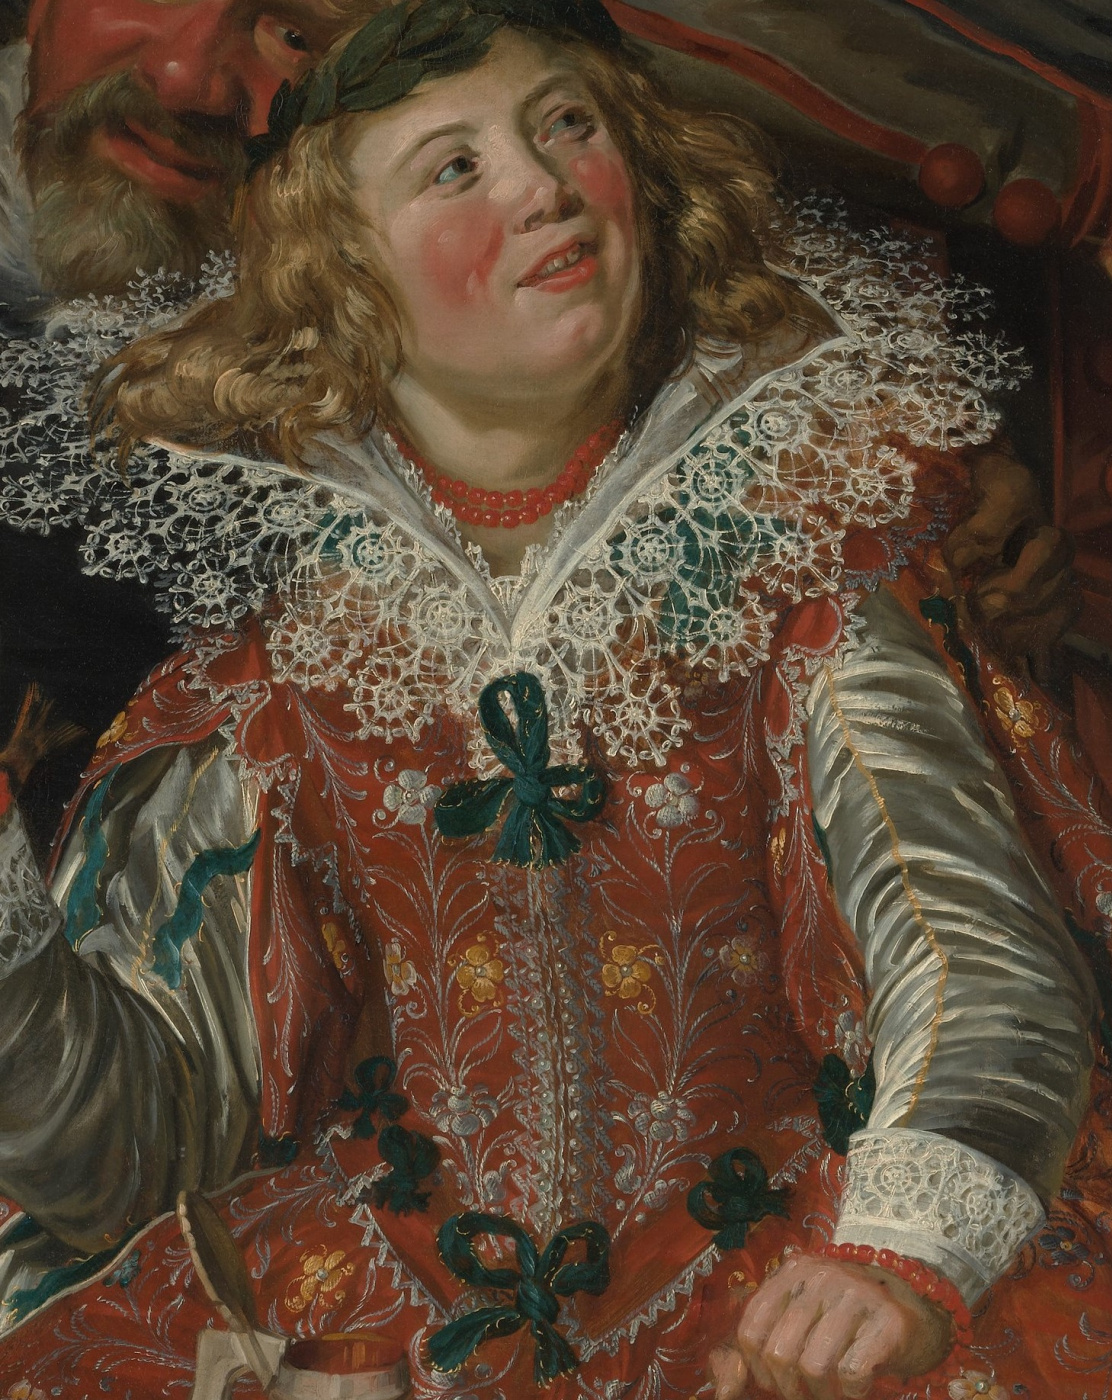 Frans Hals. Jolly Shrovetide (Merry Society). Fragment 2. Portrait of a girl